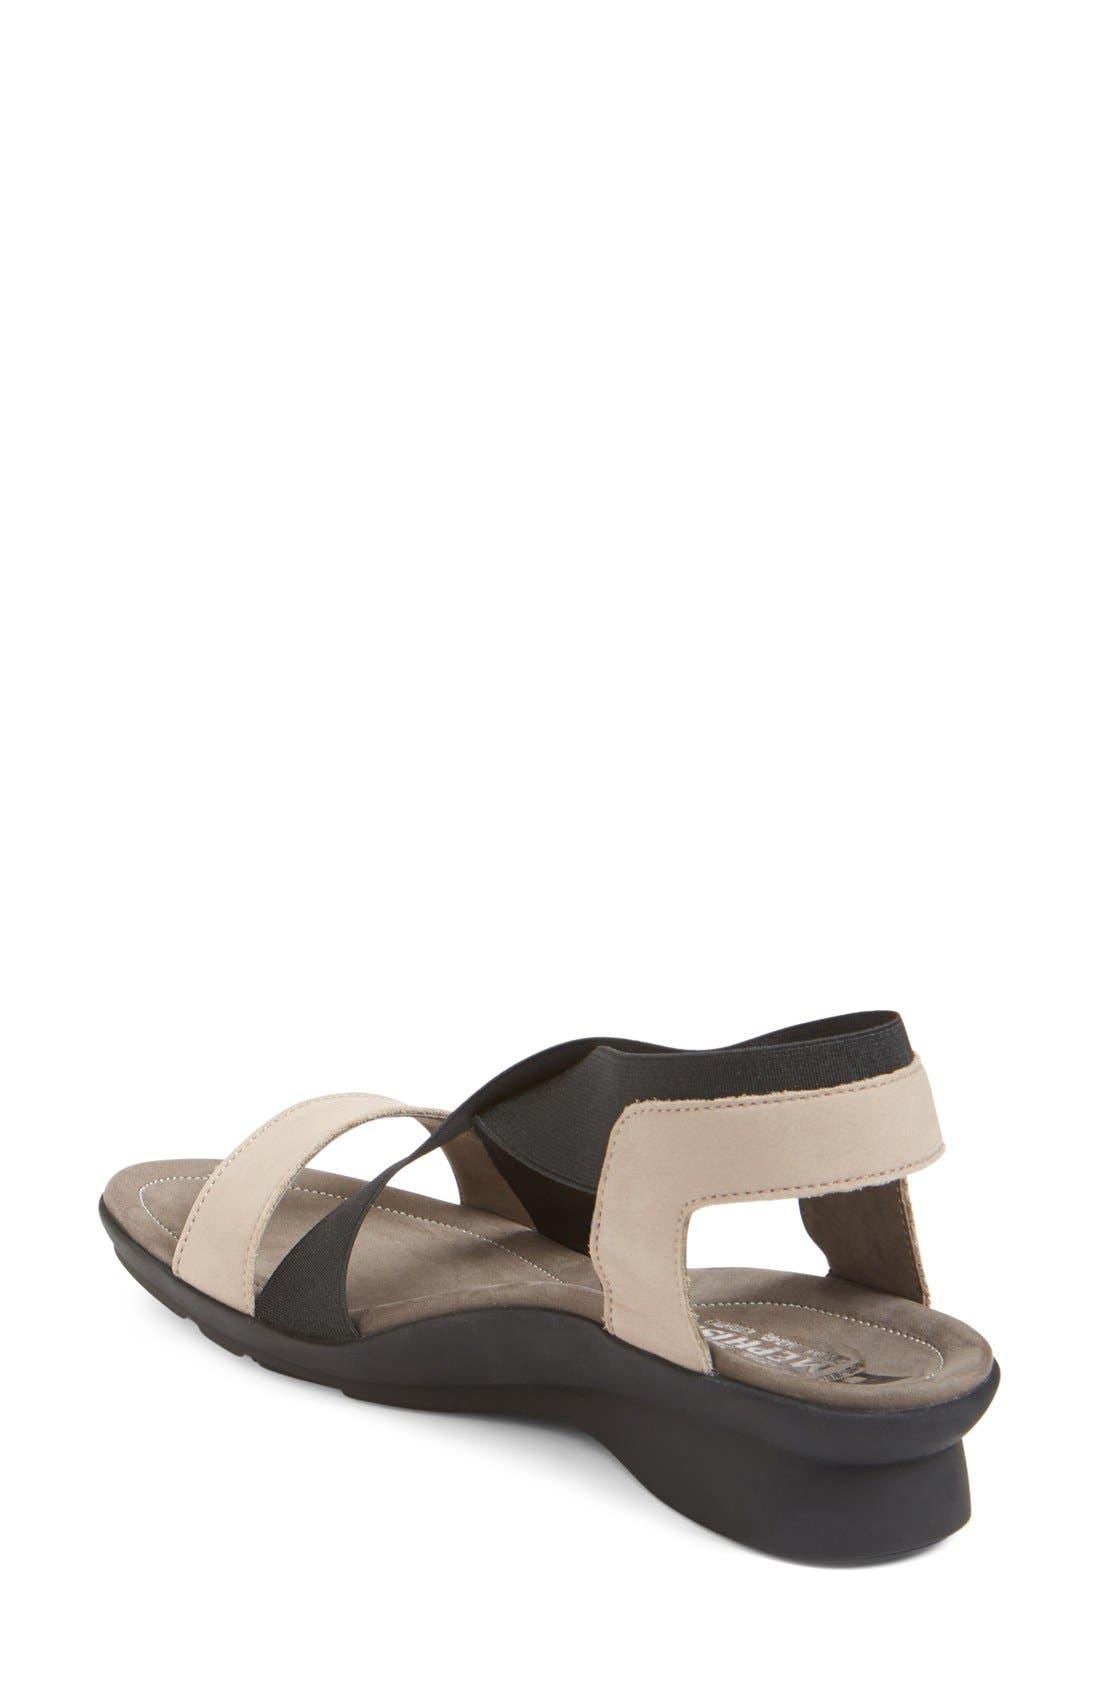 'Pastora' Sandal,                             Alternate thumbnail 2, color,                             Warm Grey